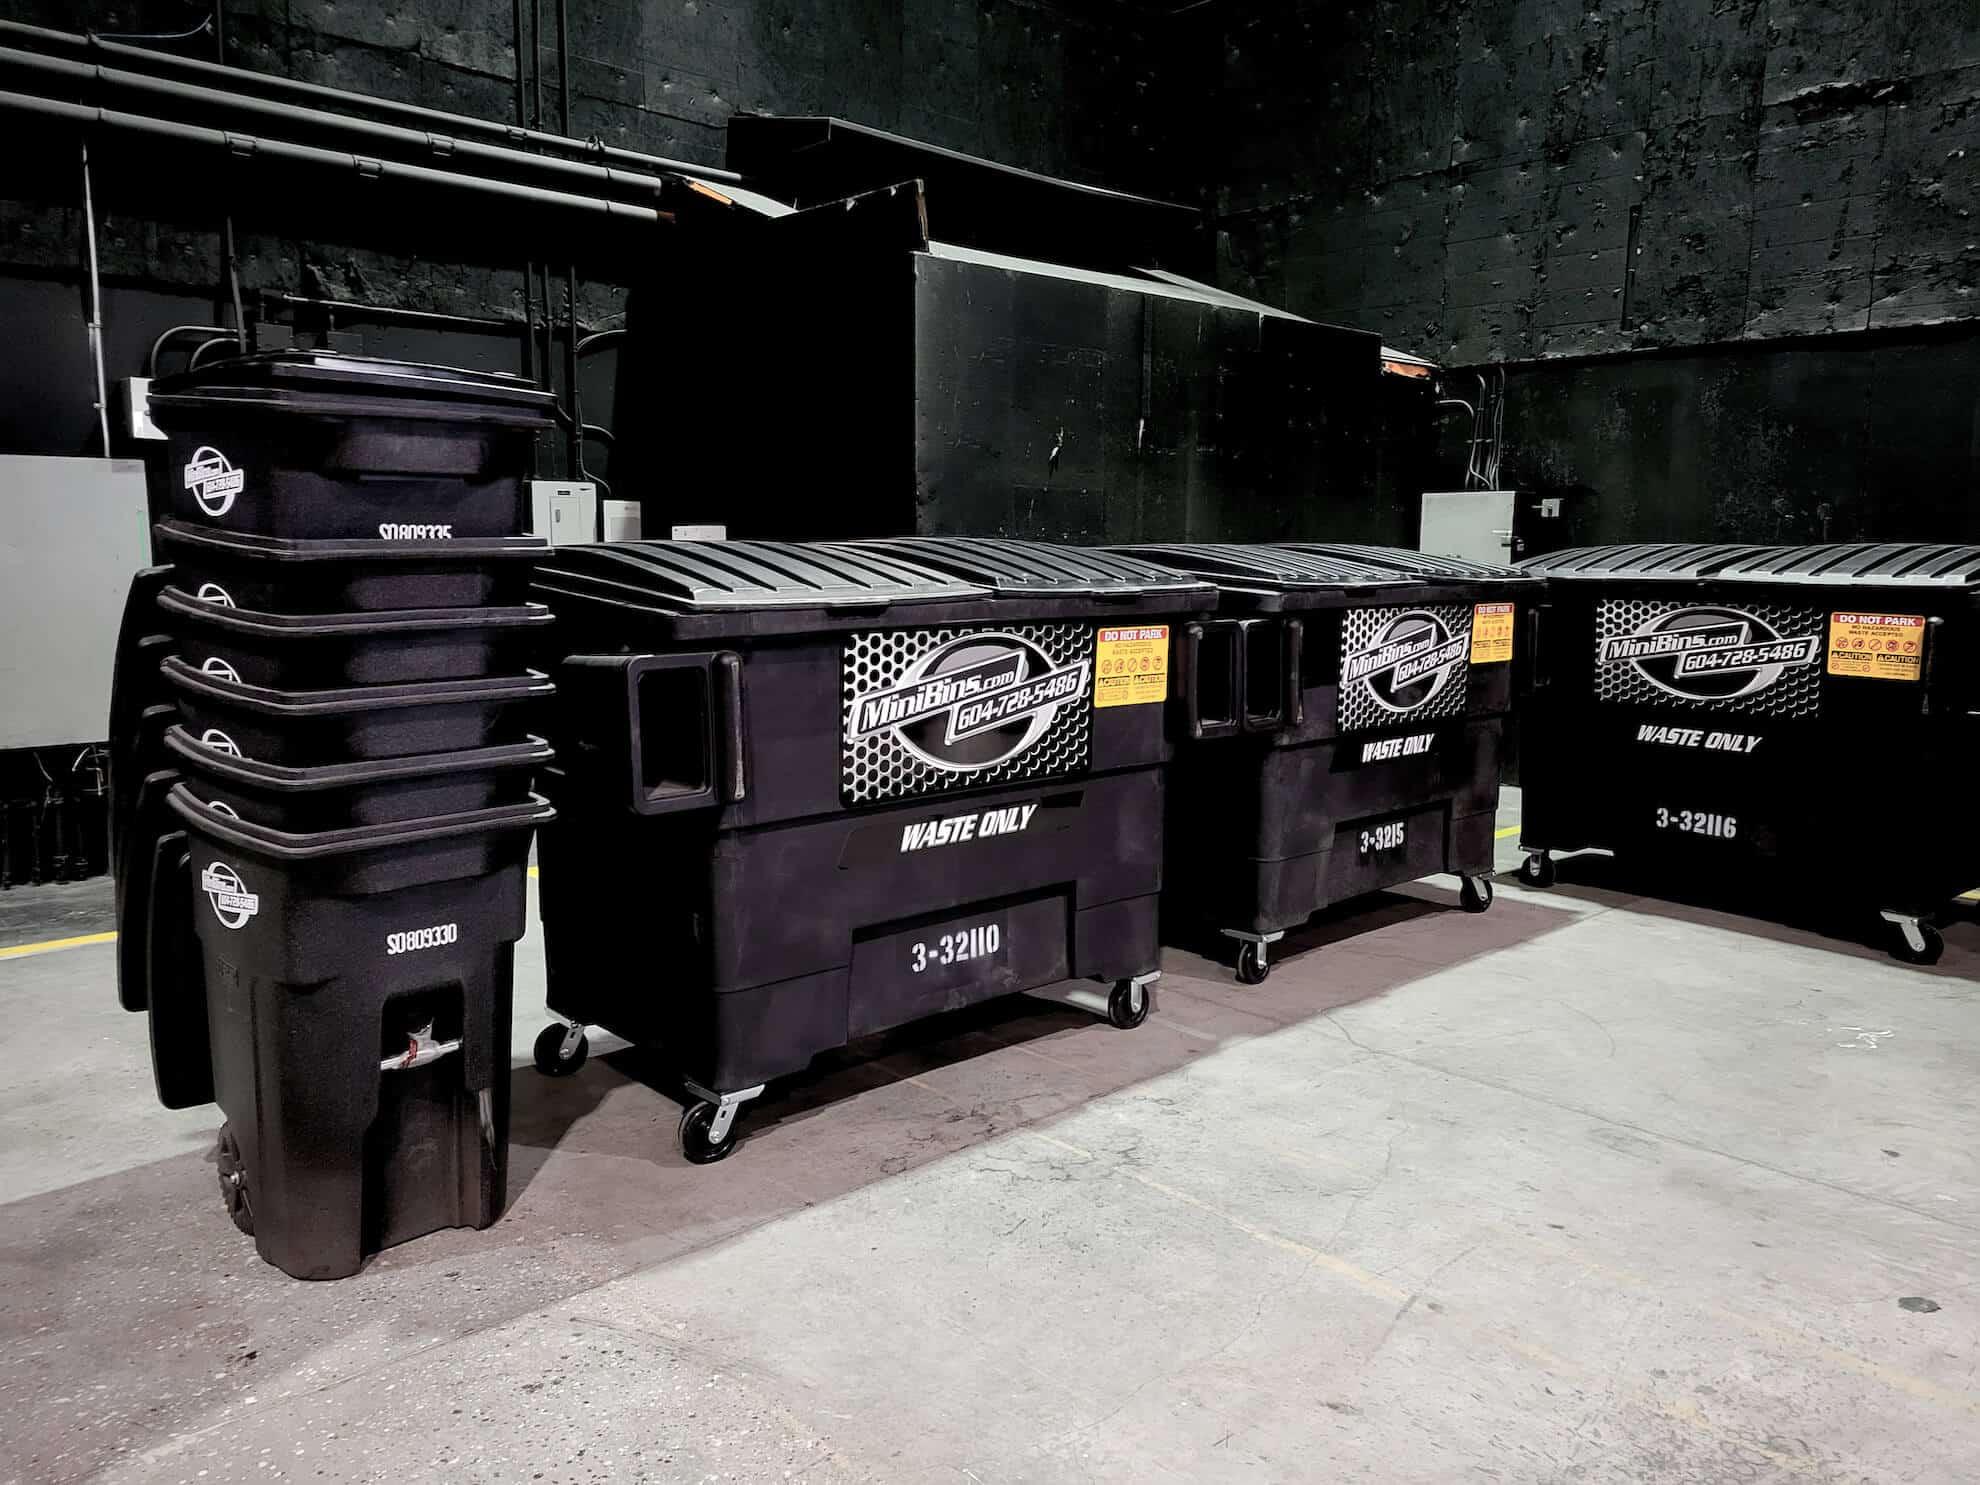 dumpster rentals Minibins vancouver